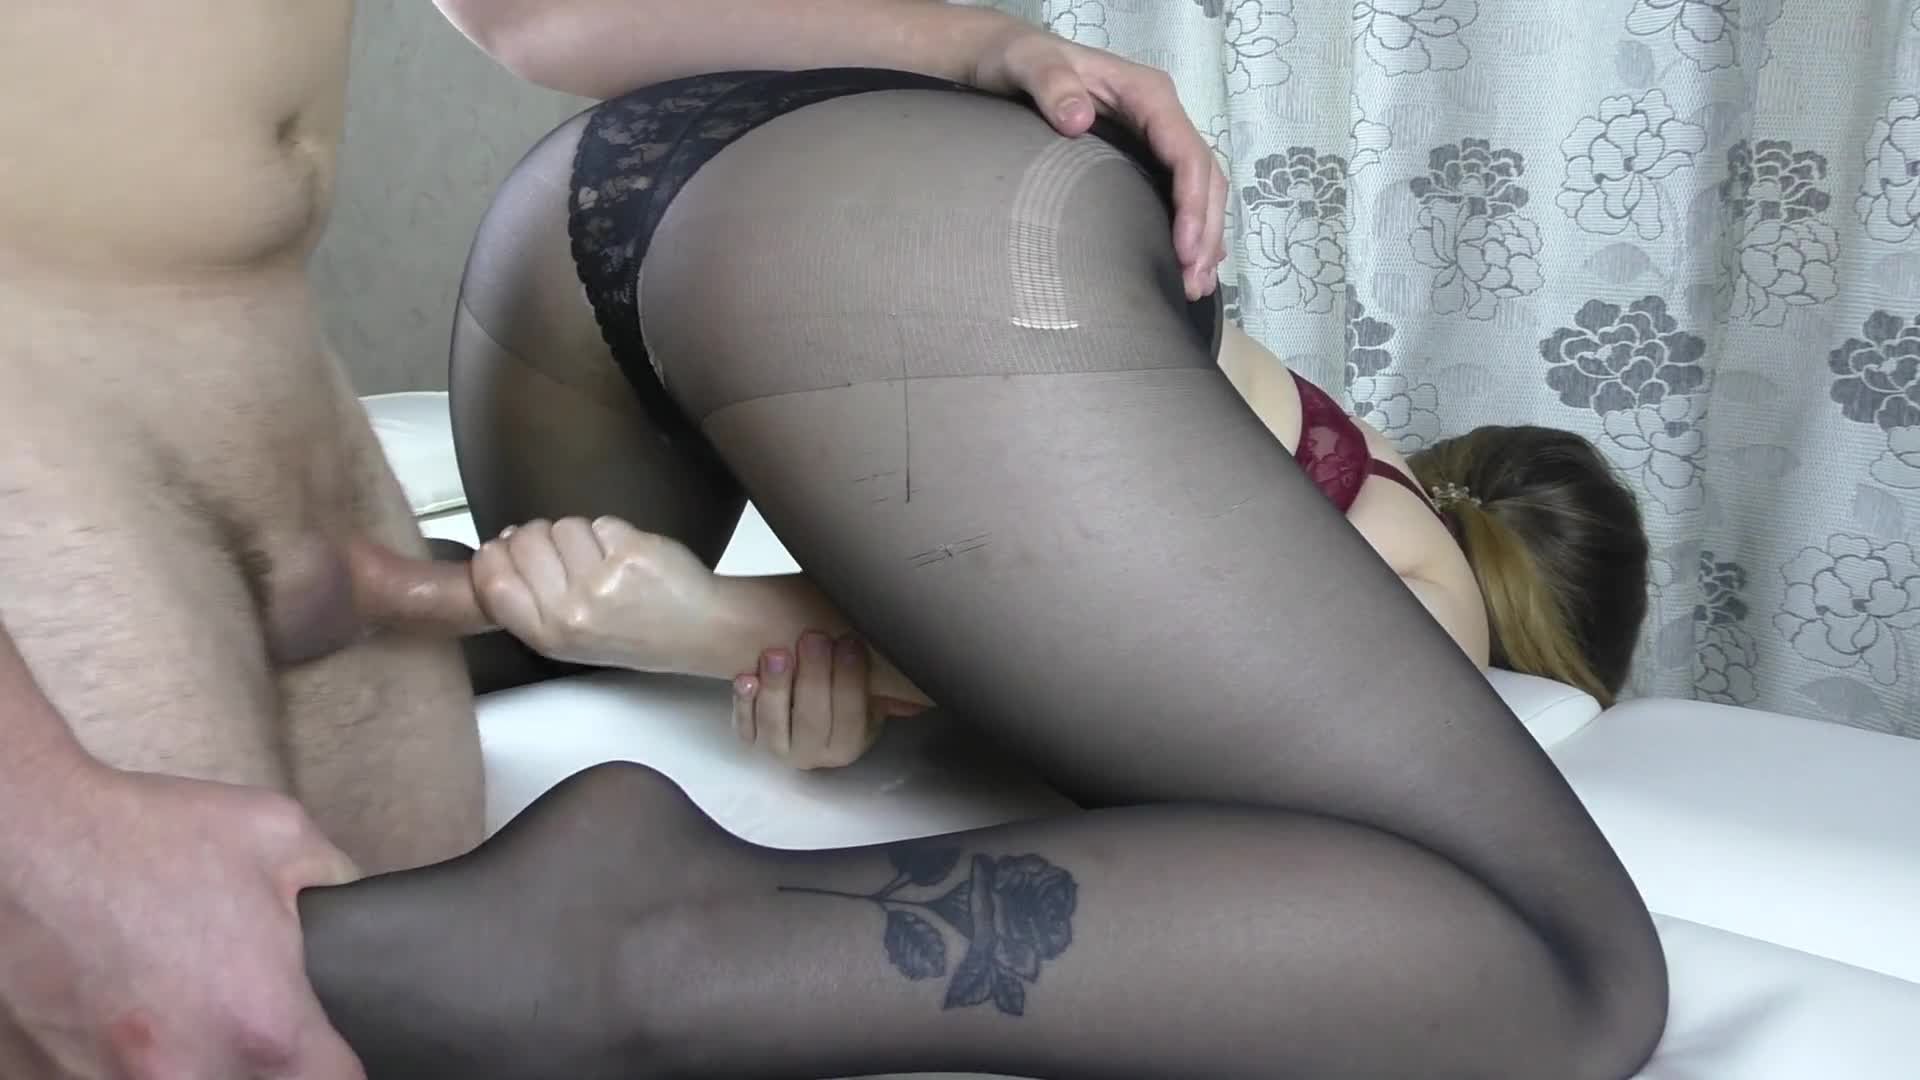 Amateur Webcam Wife Shared